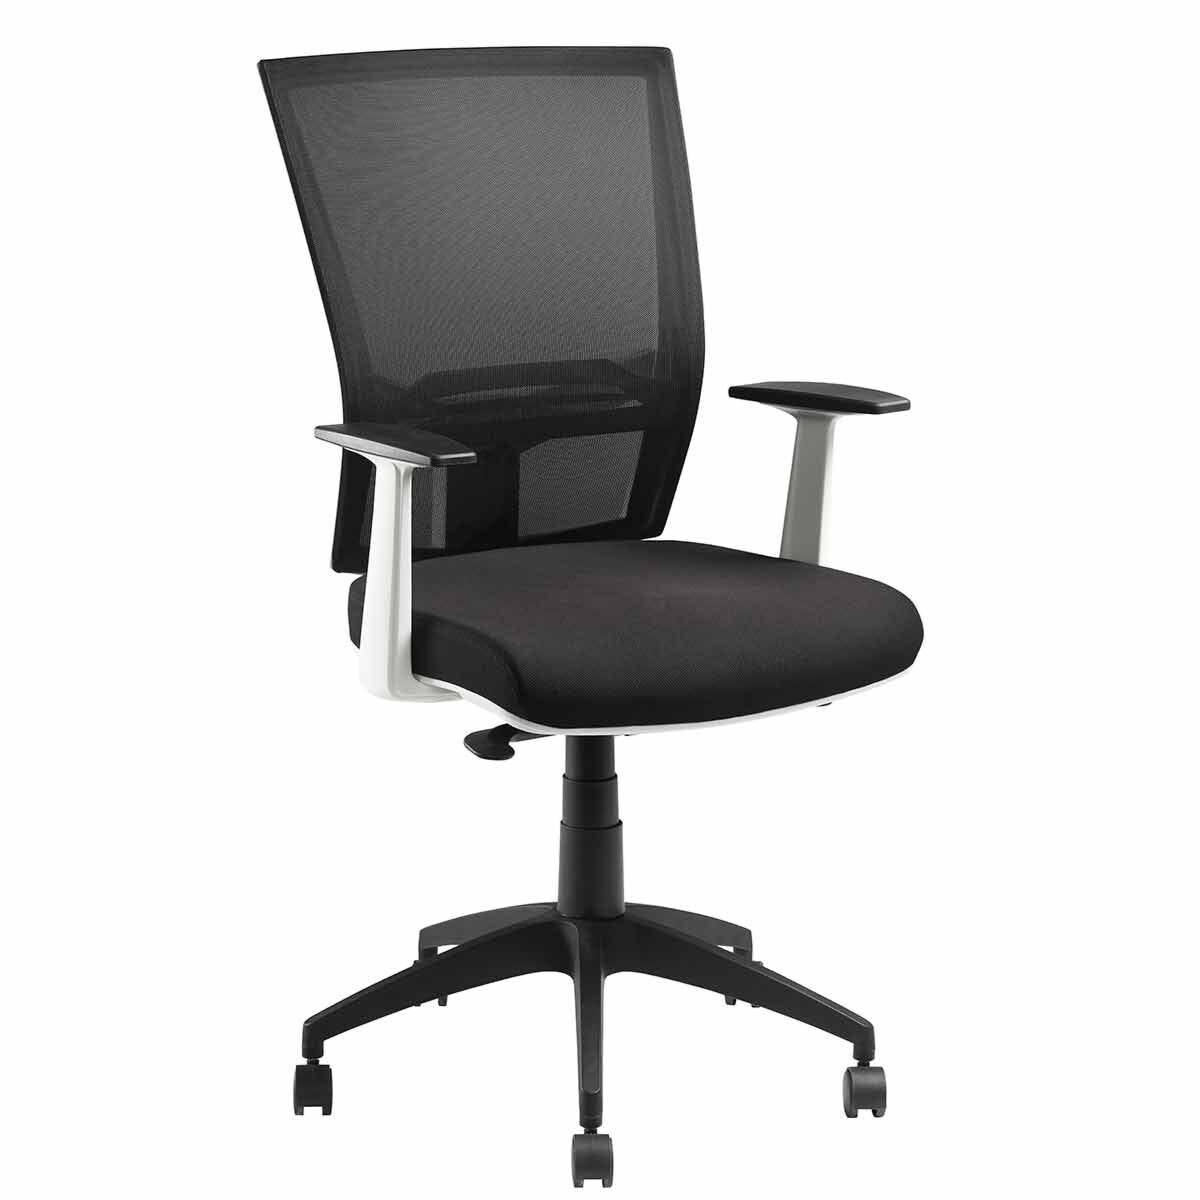 Pago Radar II White Synchro Ergonomic Chair with Arms